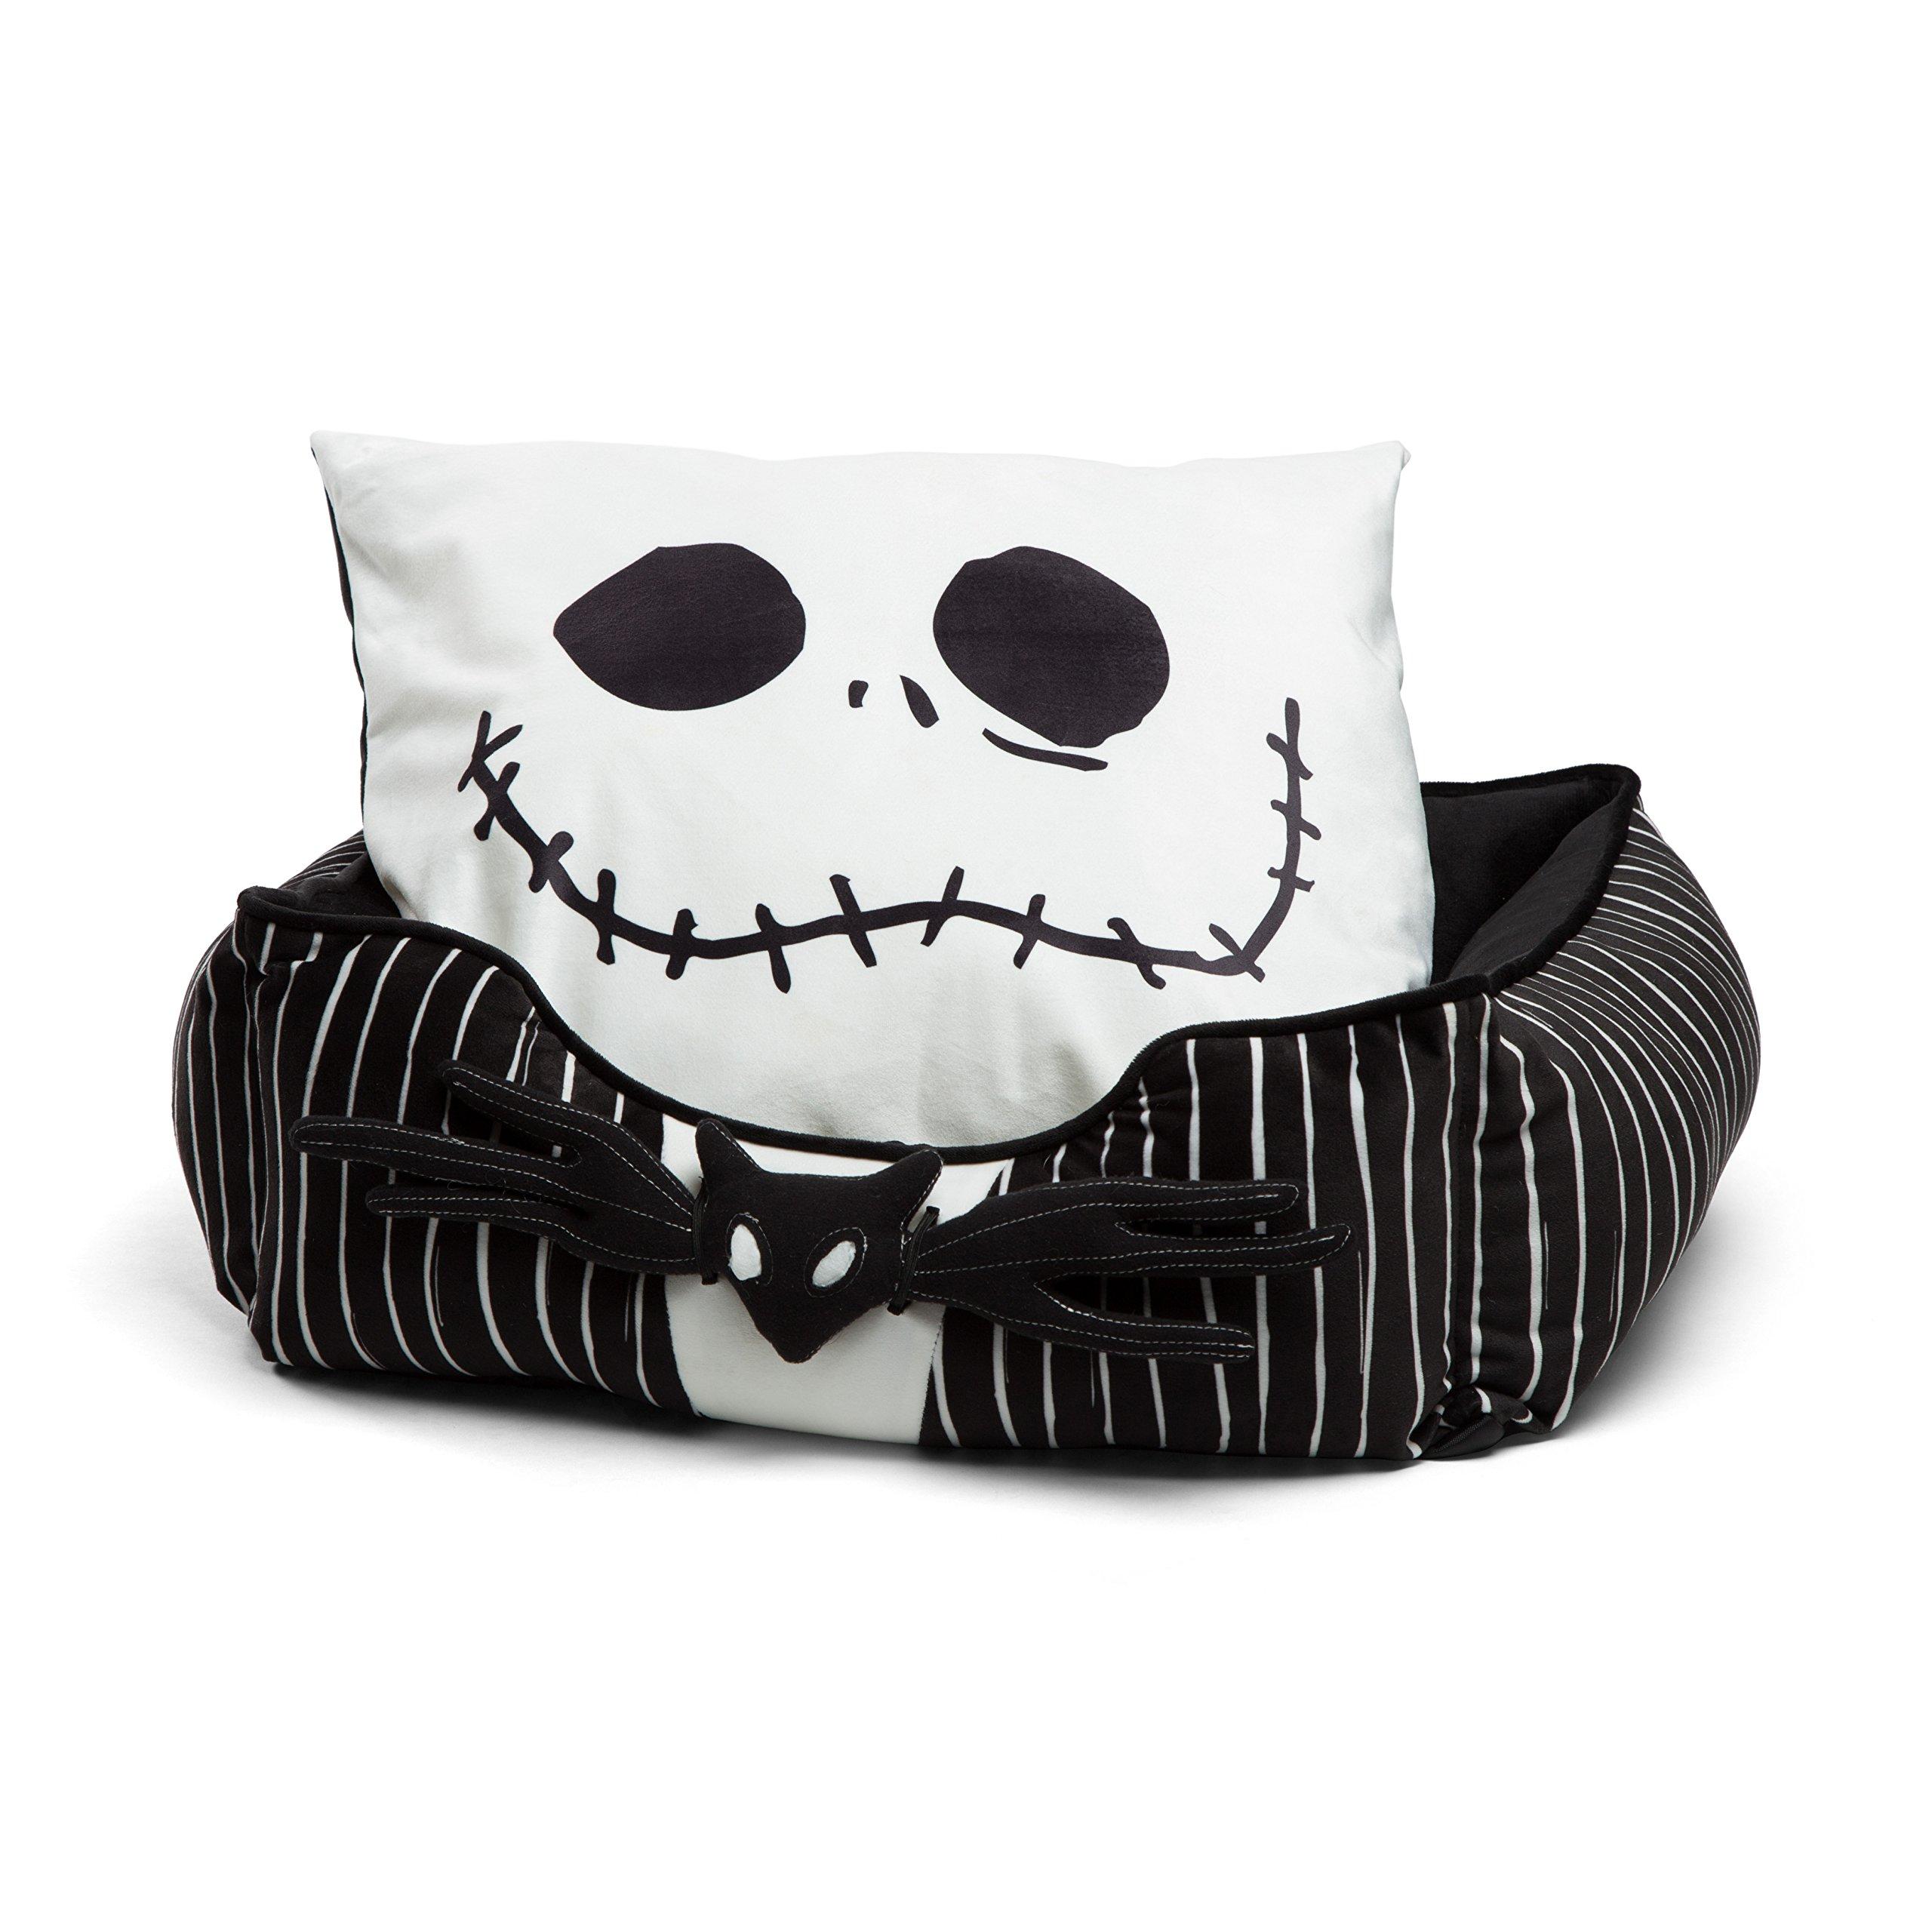 DisneyDisney Nightmare Before Christmas Jack Skellington Bolstered Corded Rectangular Cuddler Dog Bed/Cat Bed with Removable Toy bat 21''x19''x8''